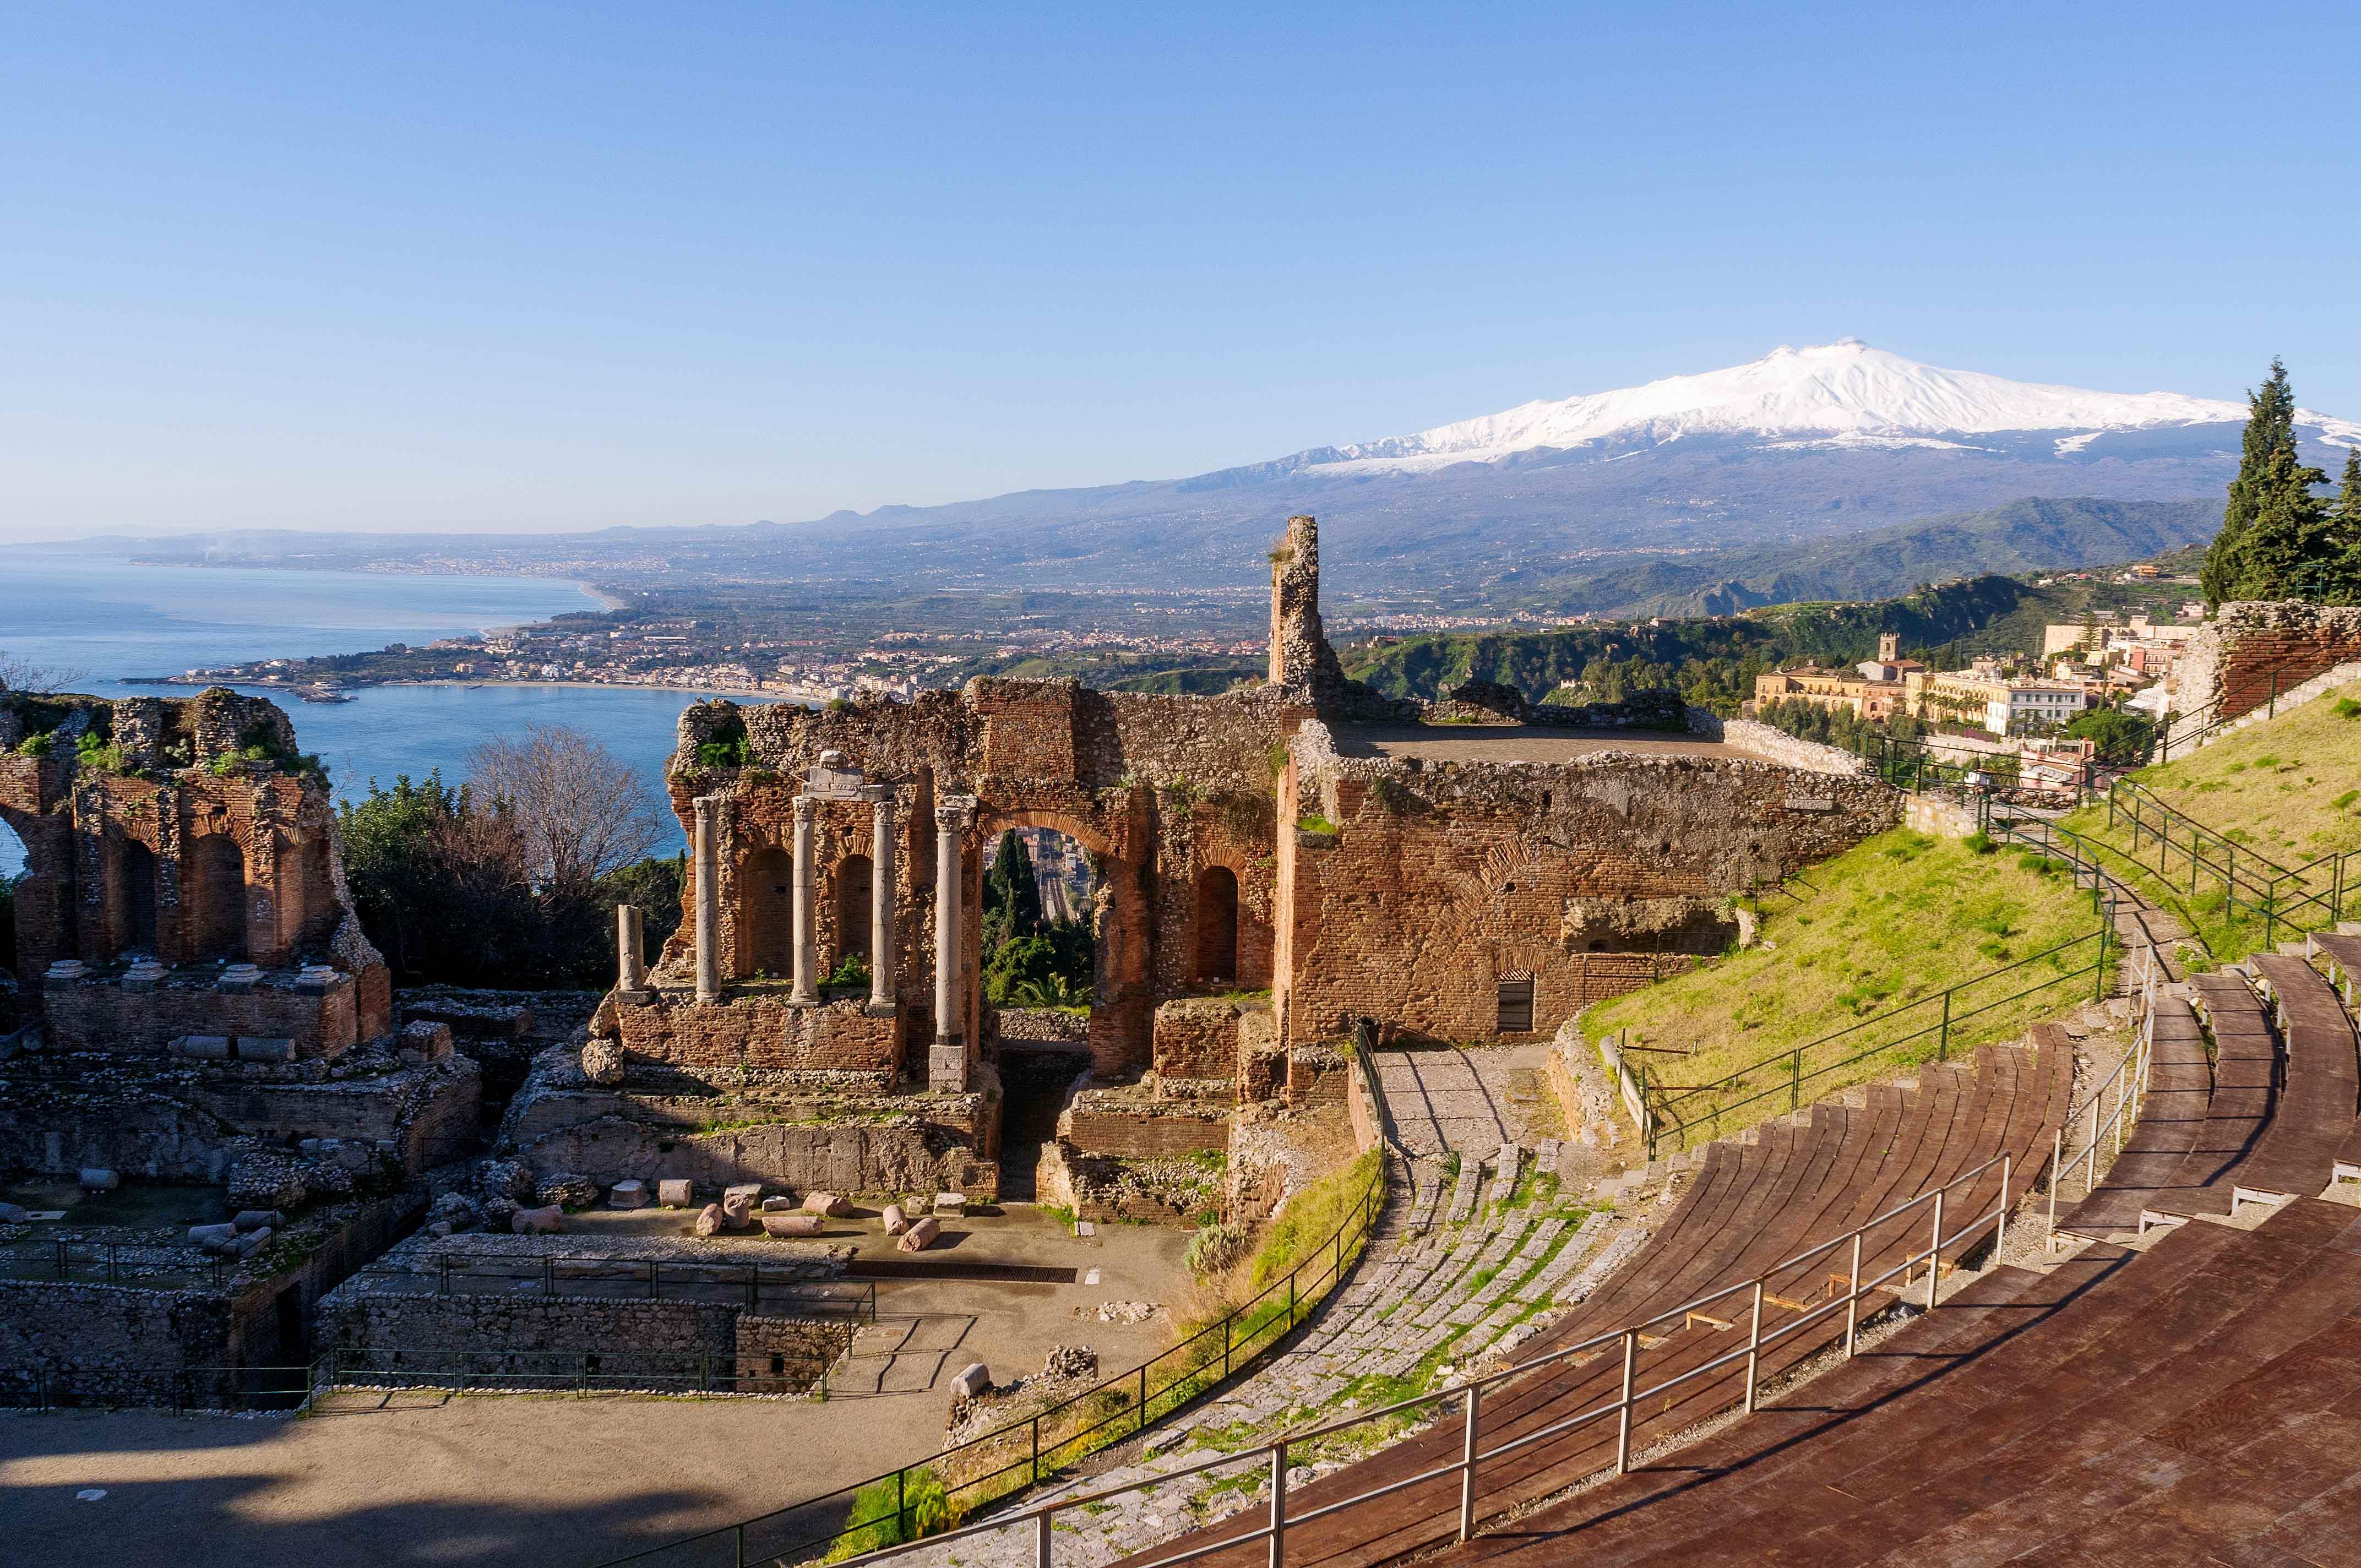 Taormine, Savoca et Castelmola